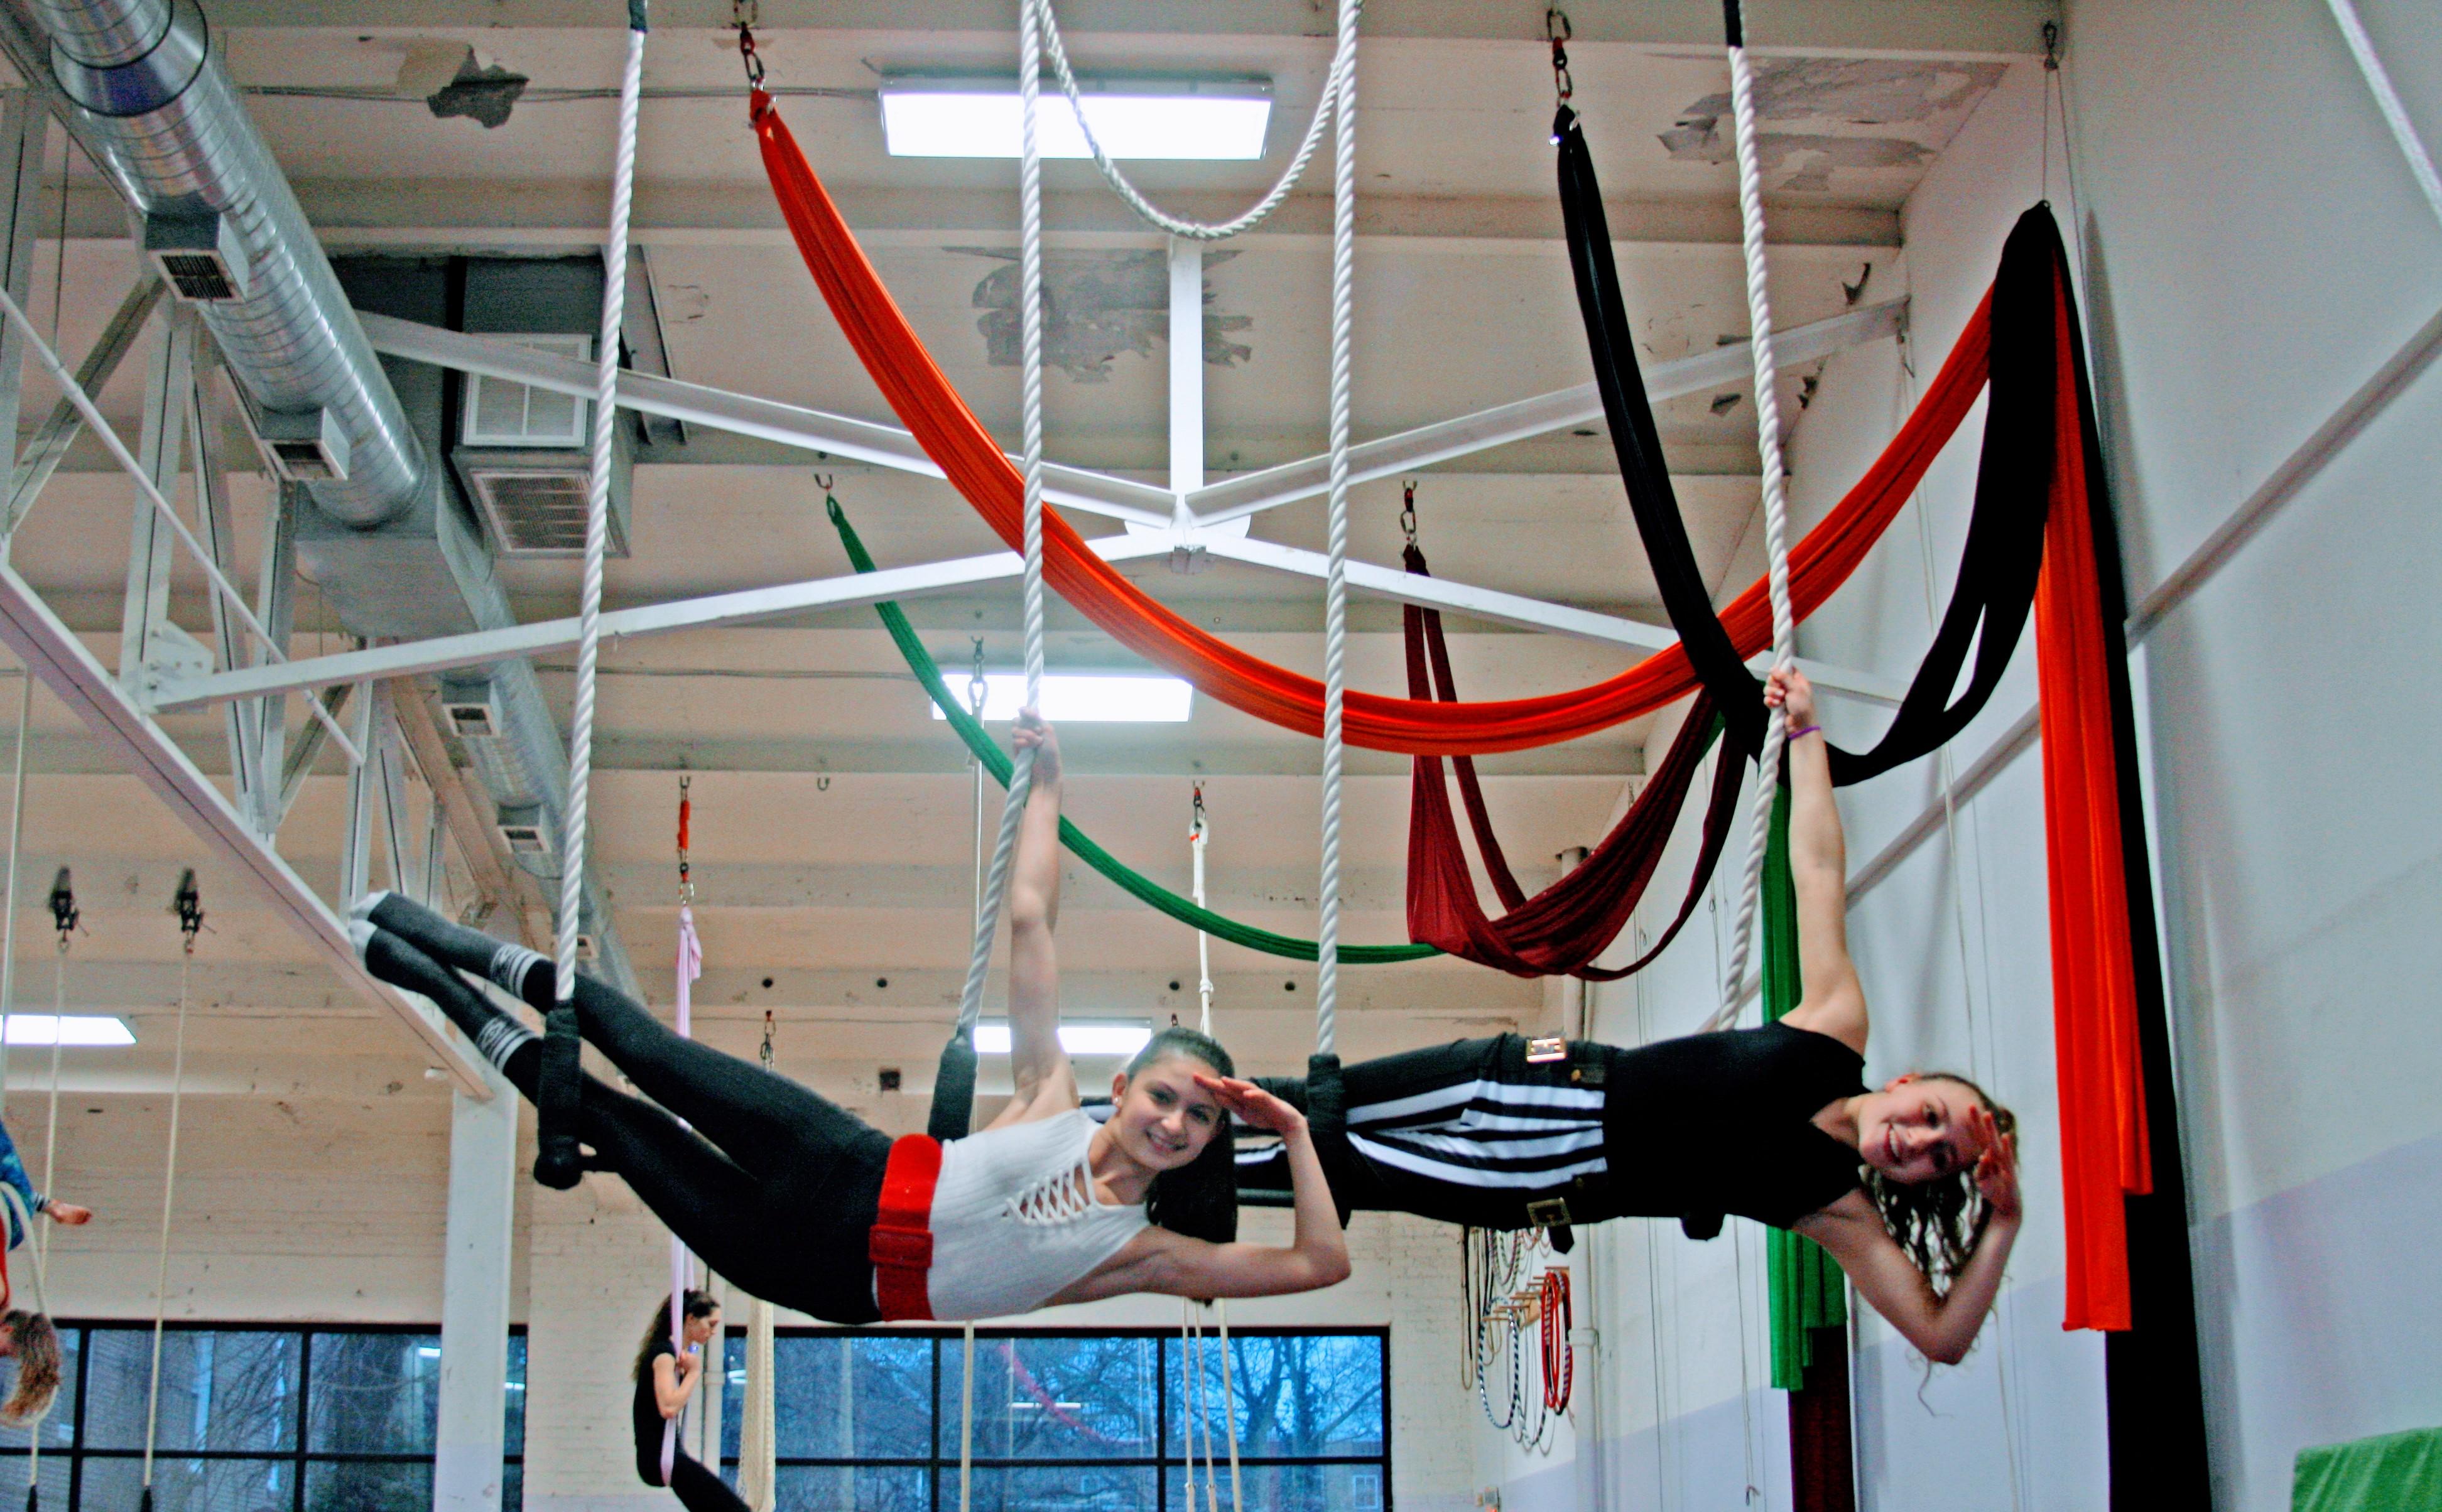 Neverland: Origins Youth Circus Soiree at Philadelphia School of Circus Arts